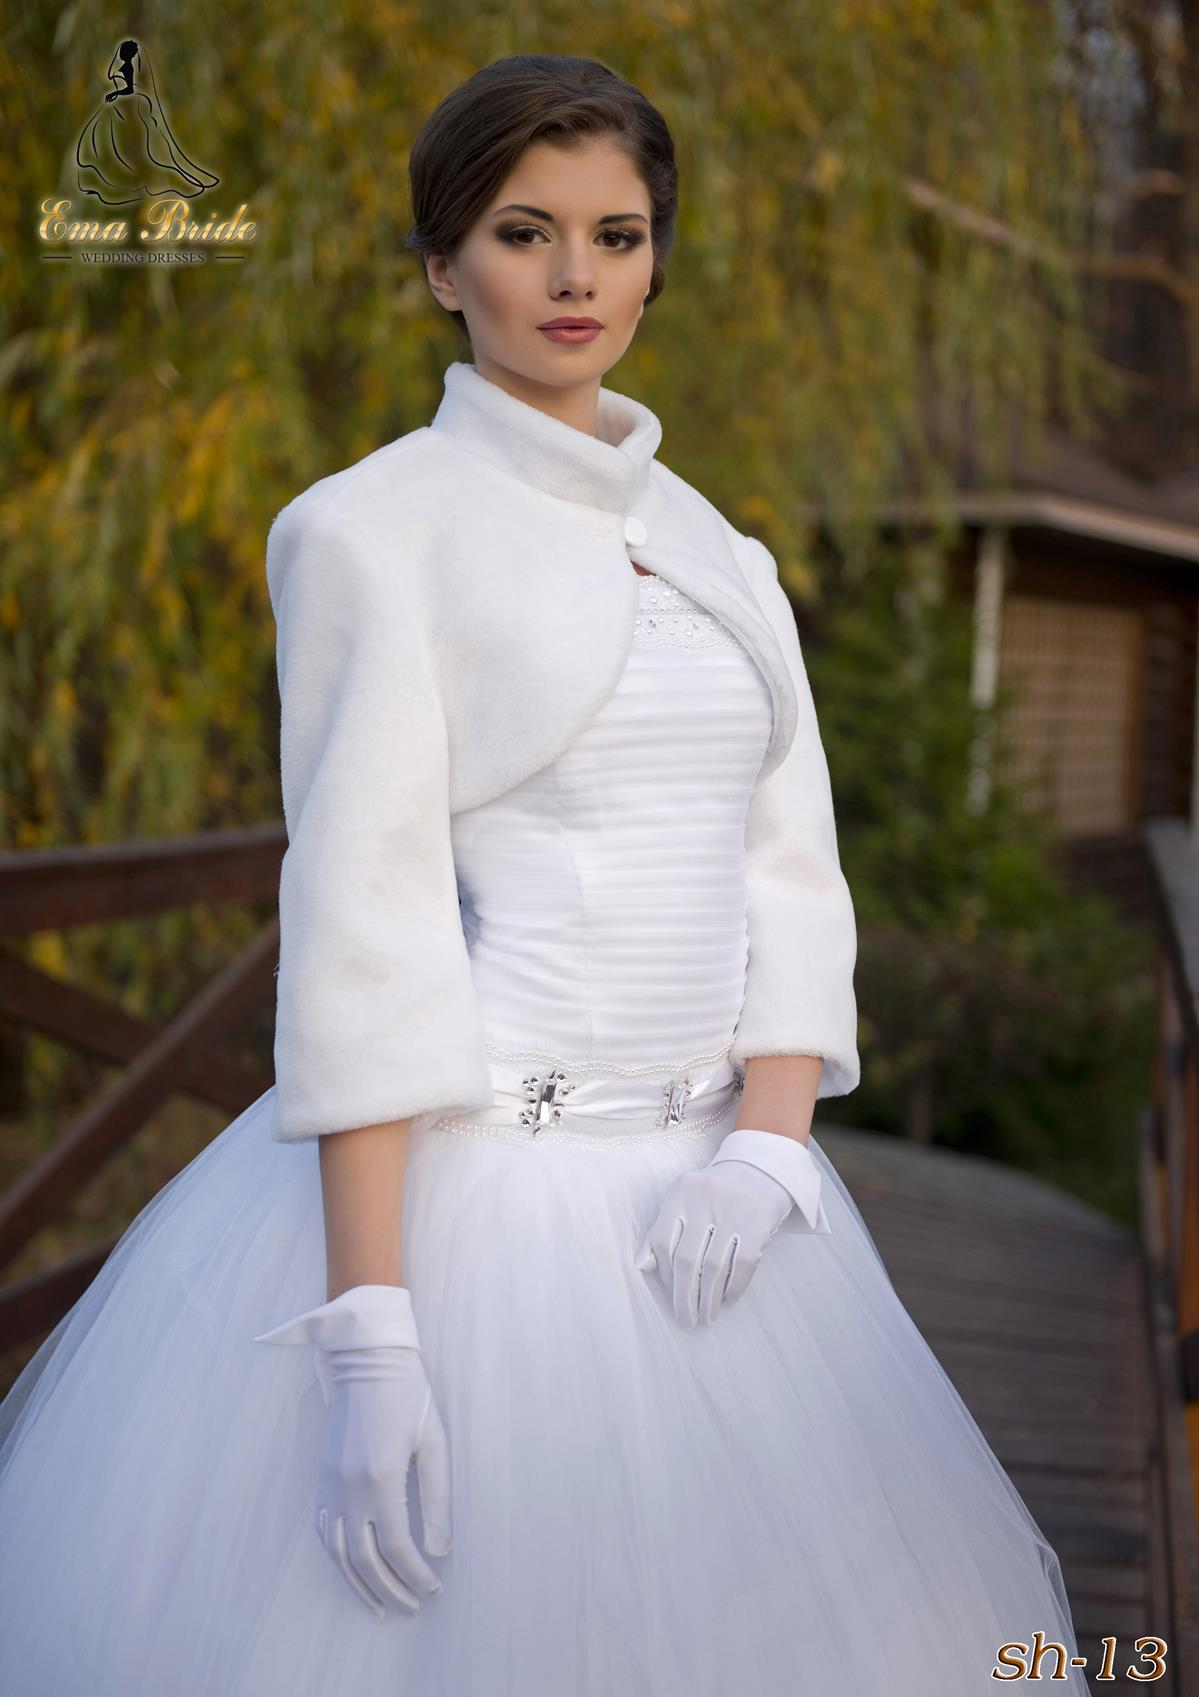 Elegant wedding coat